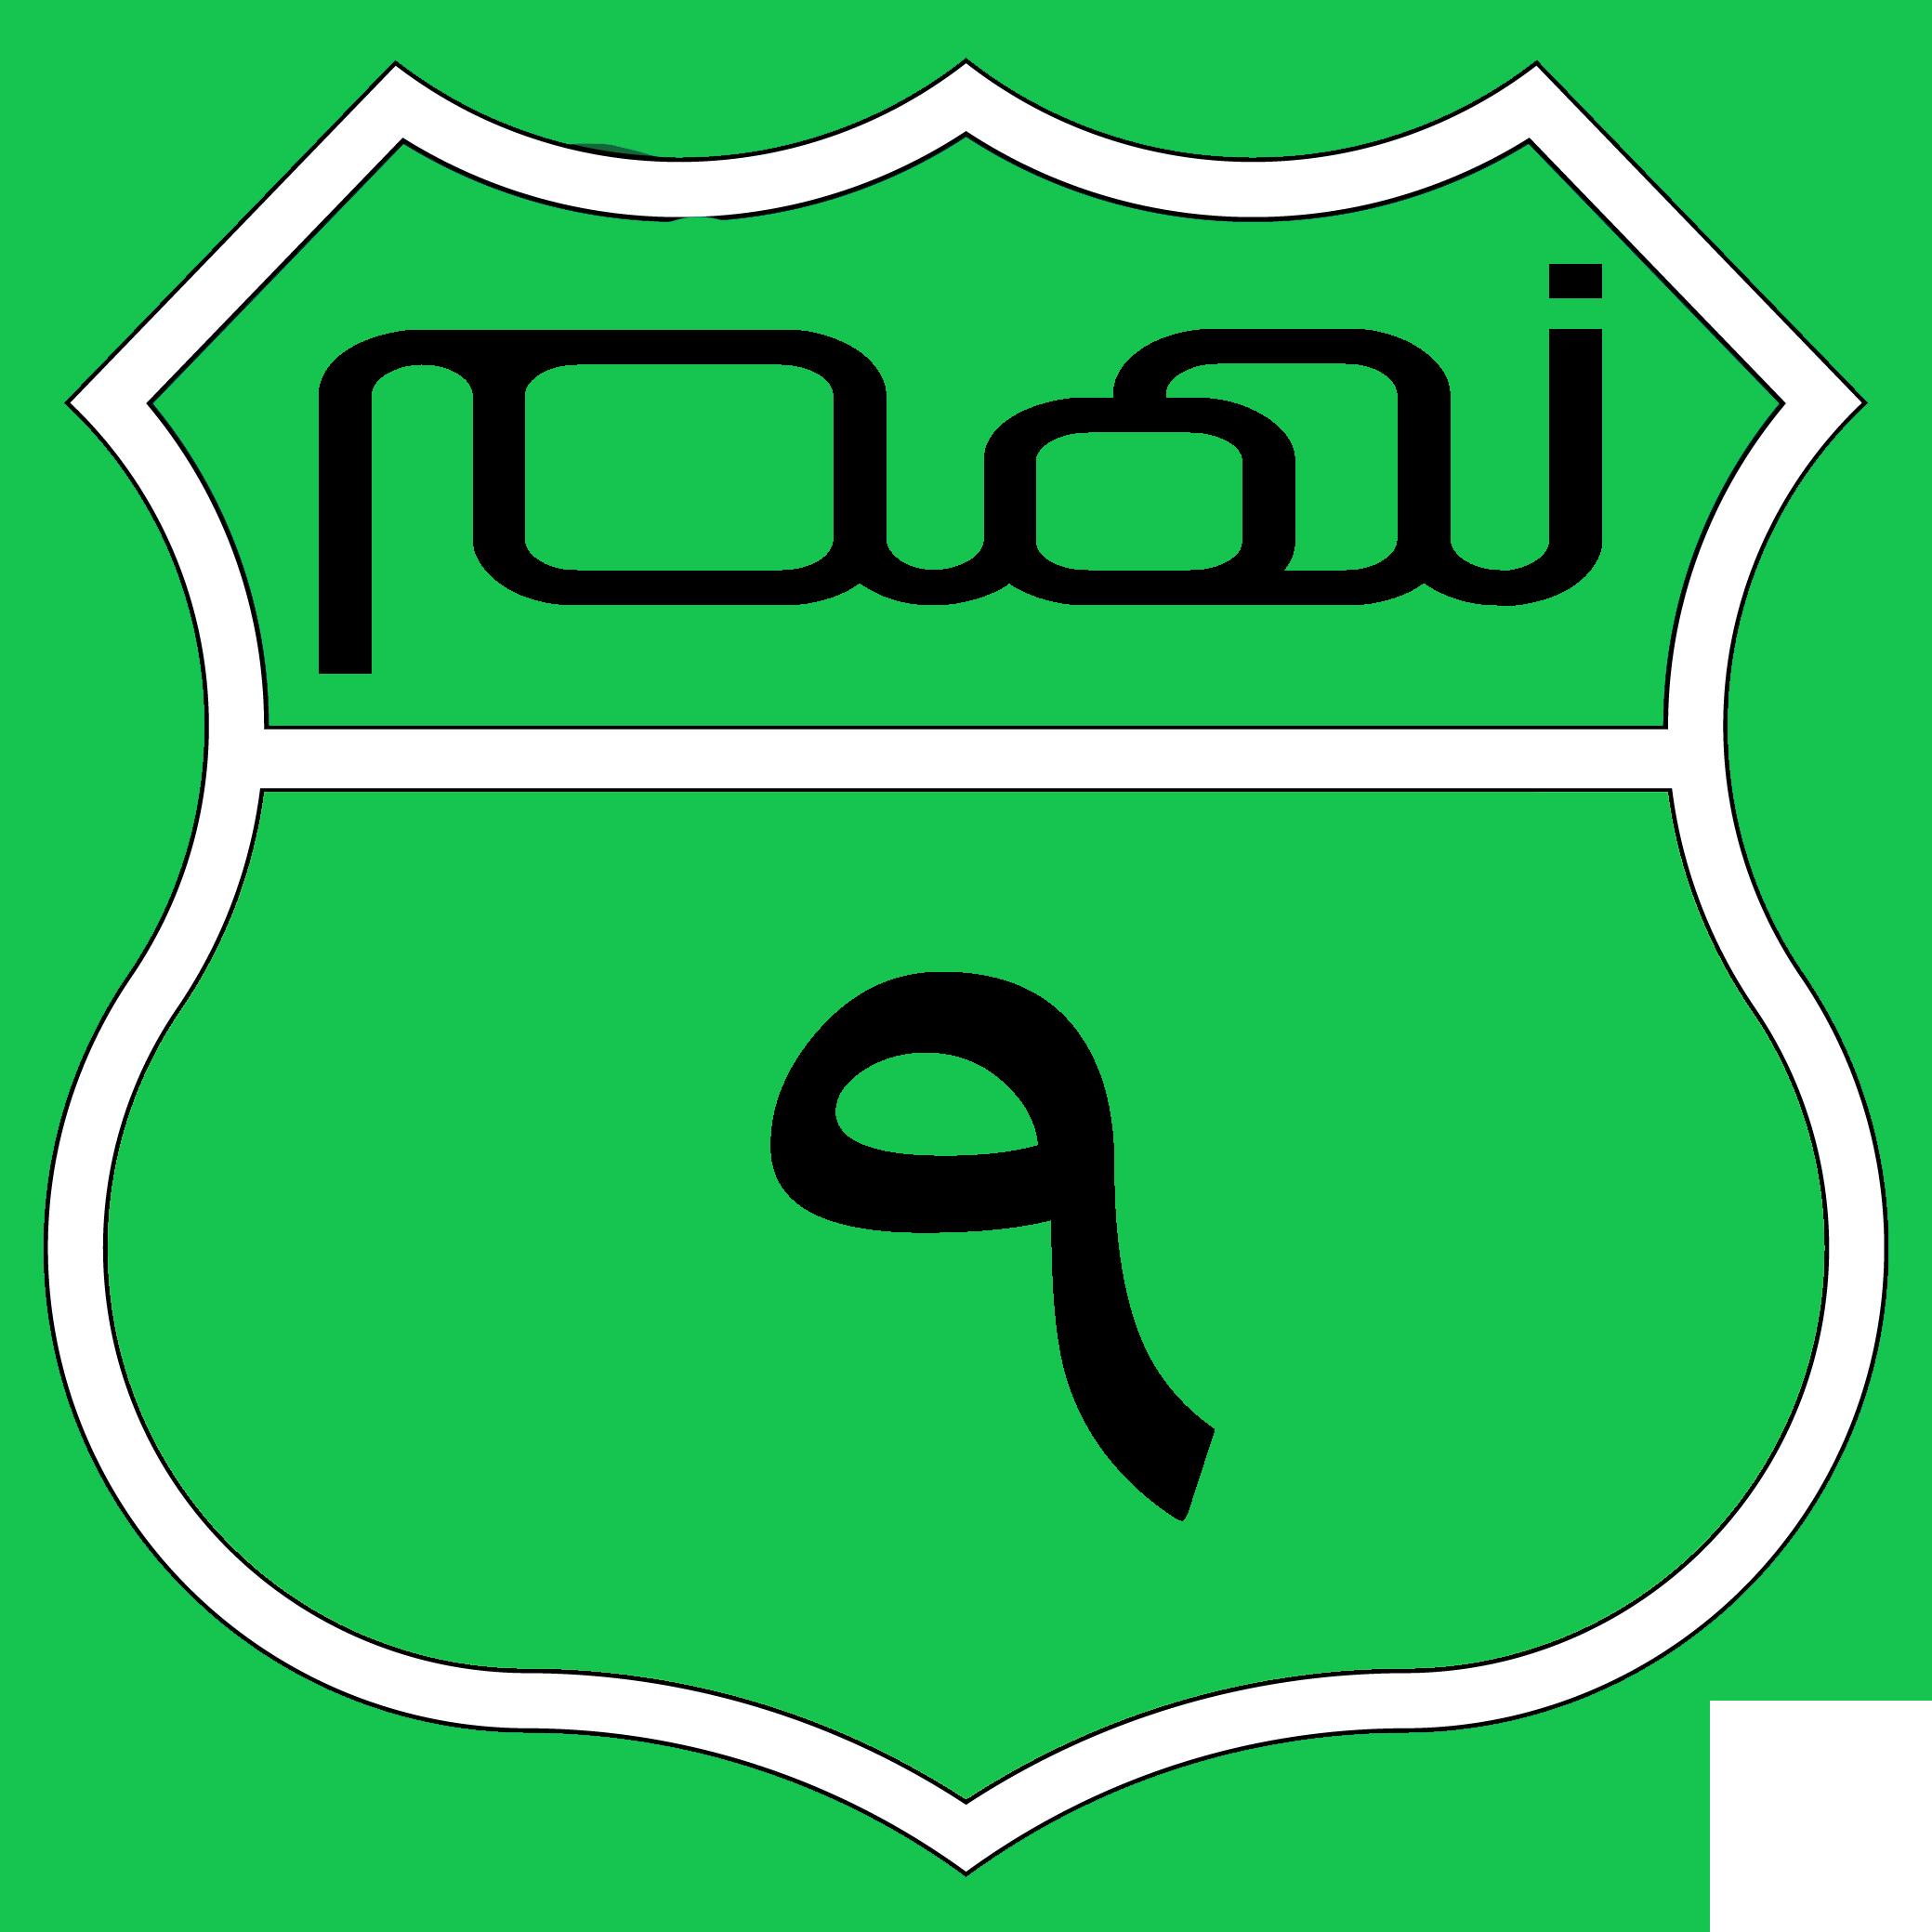 http://cloner700.persiangig.com/9OOM/logo.png